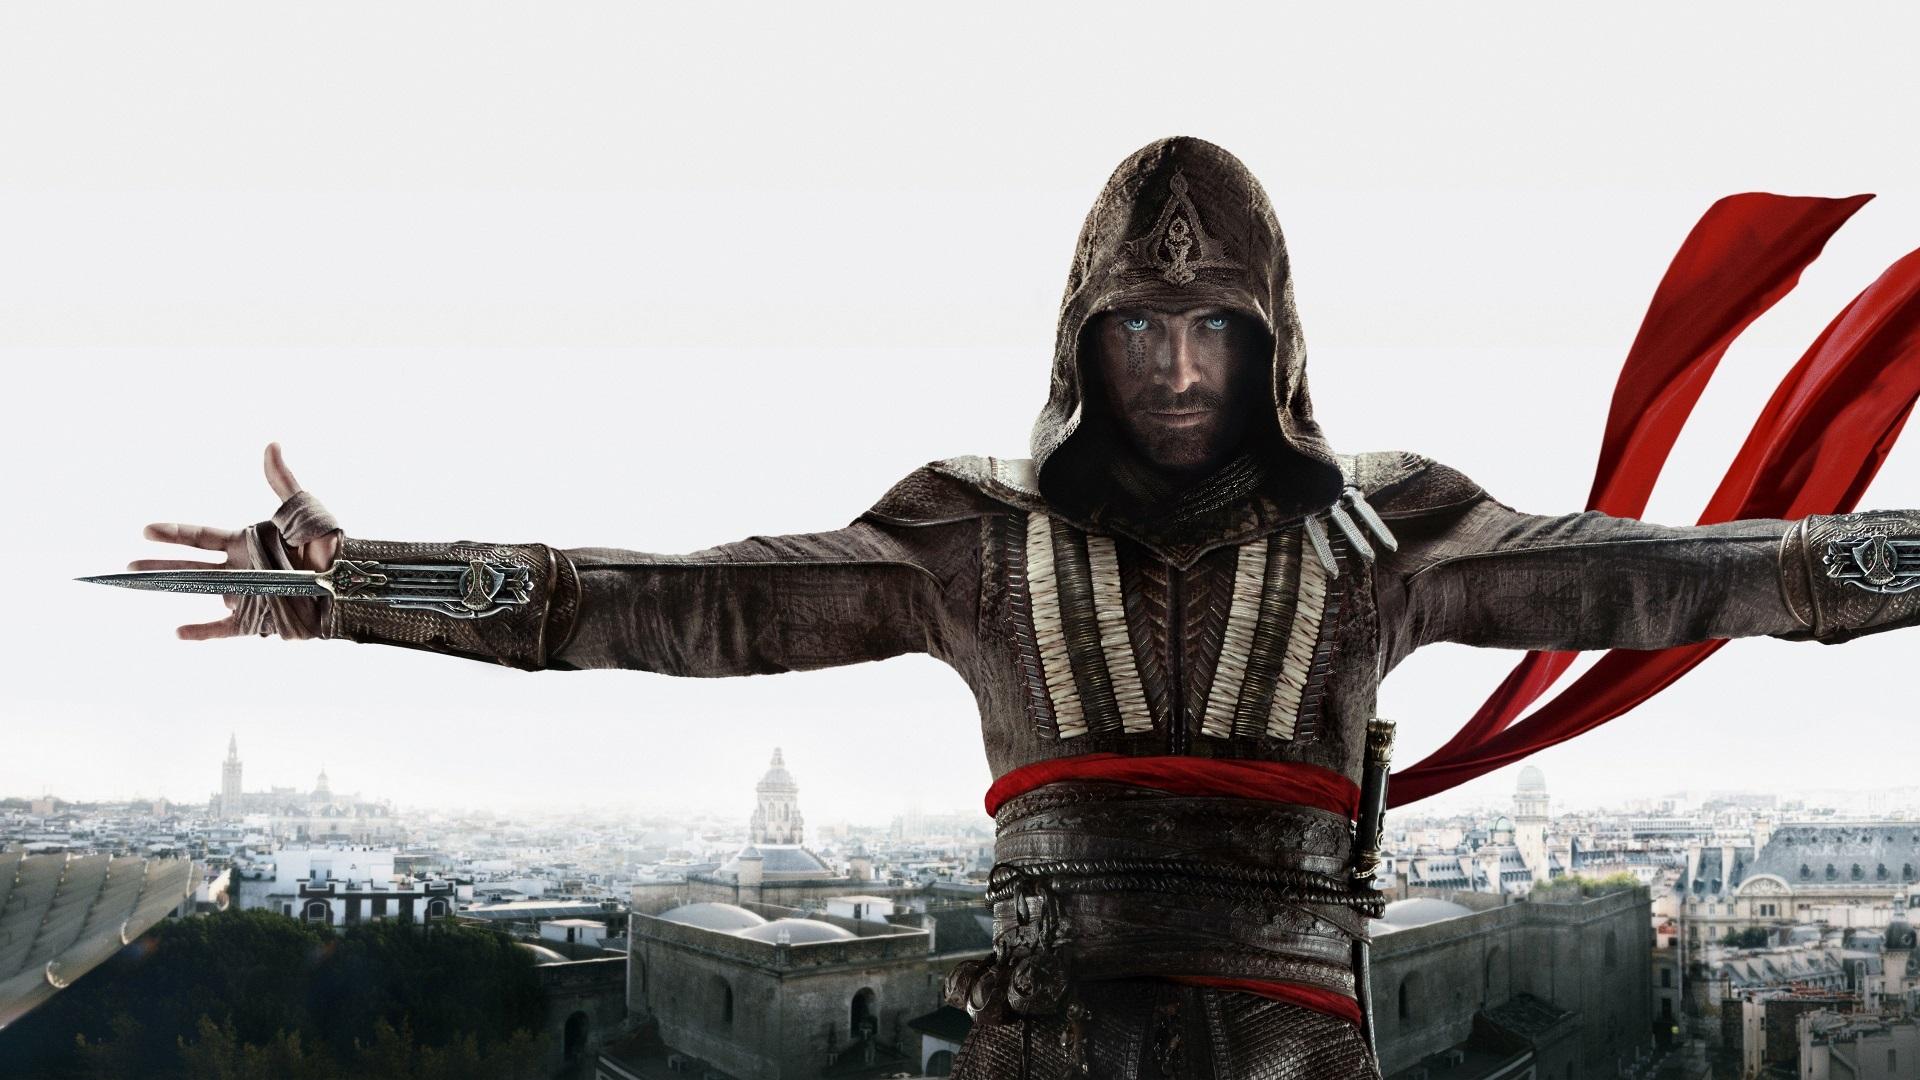 Movie Fanart: Assassin's Creed